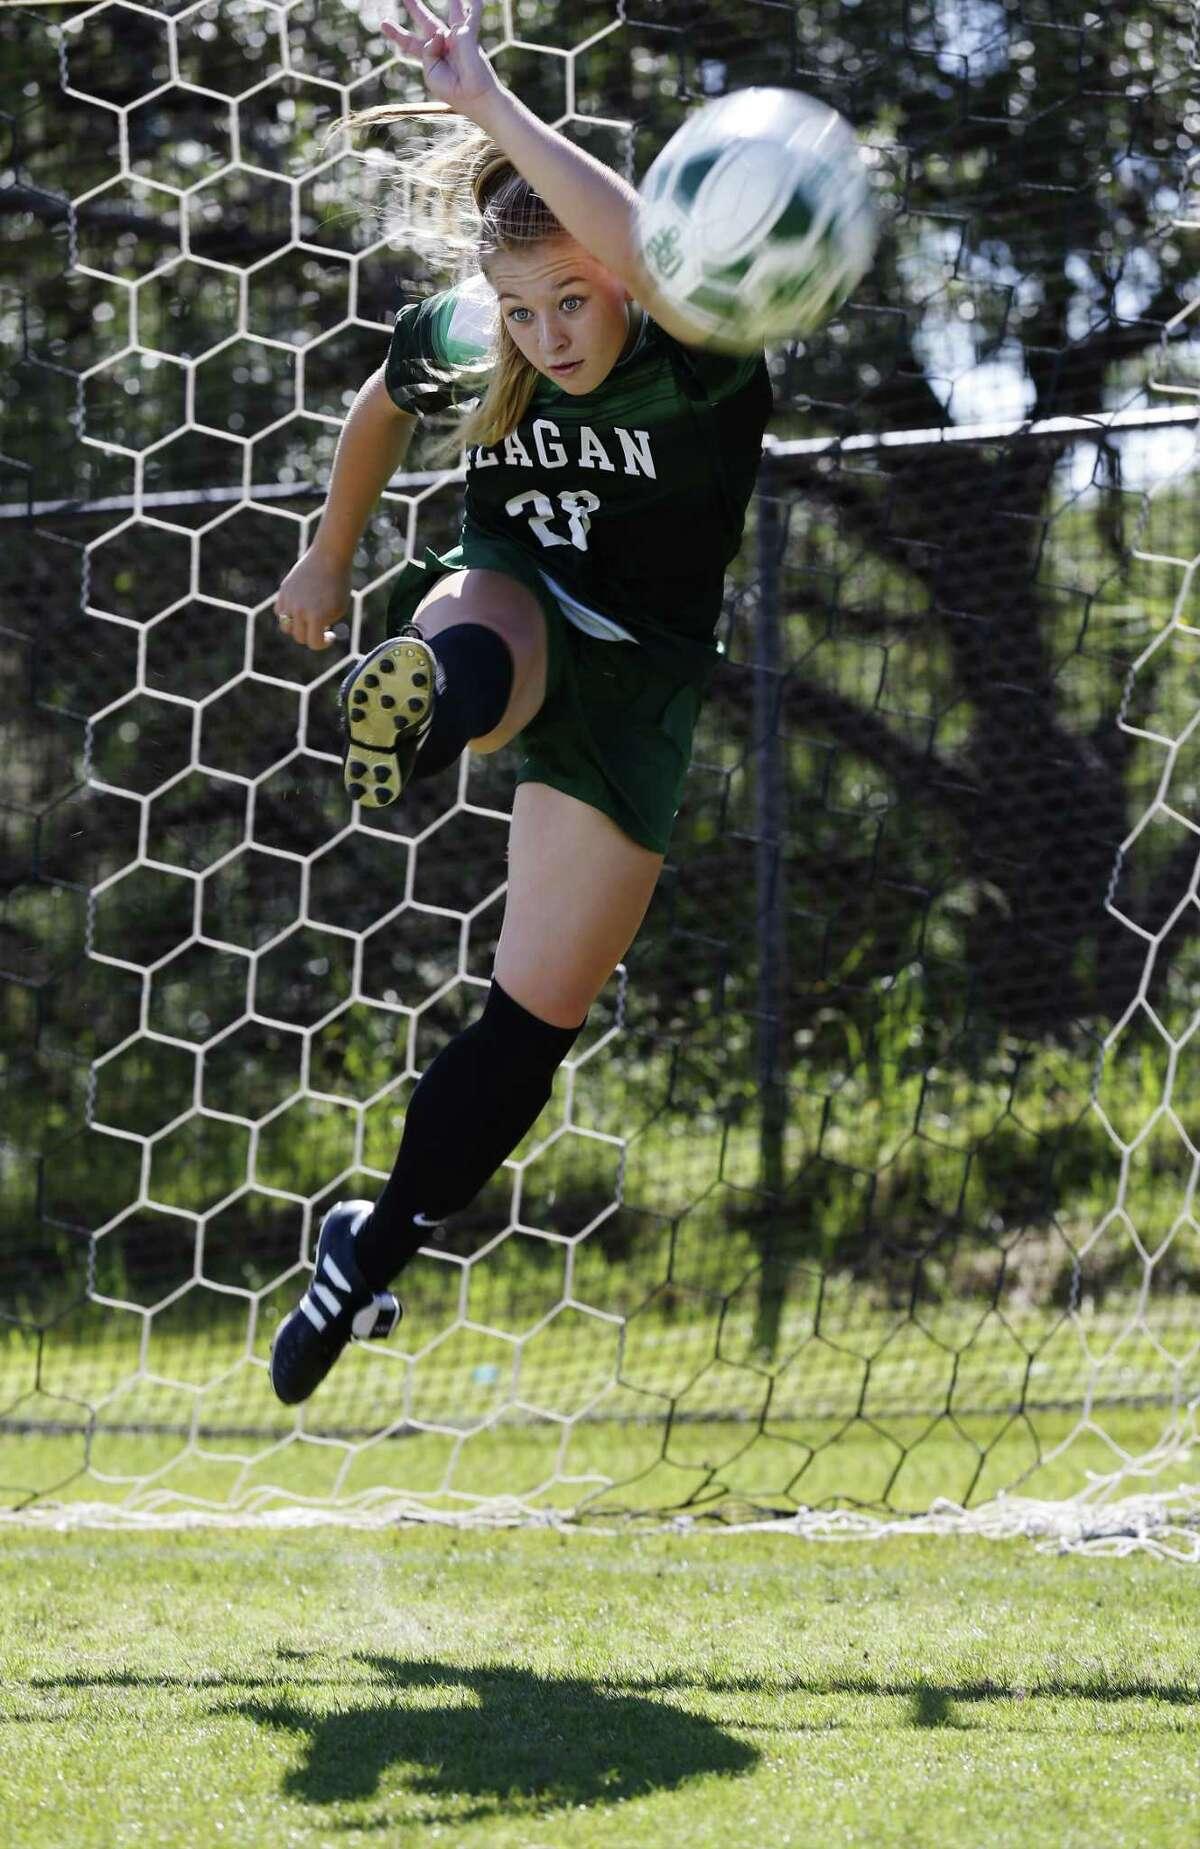 Reagan soccer star Taylor Olson strikes the ball during a photo shoot in 2017.